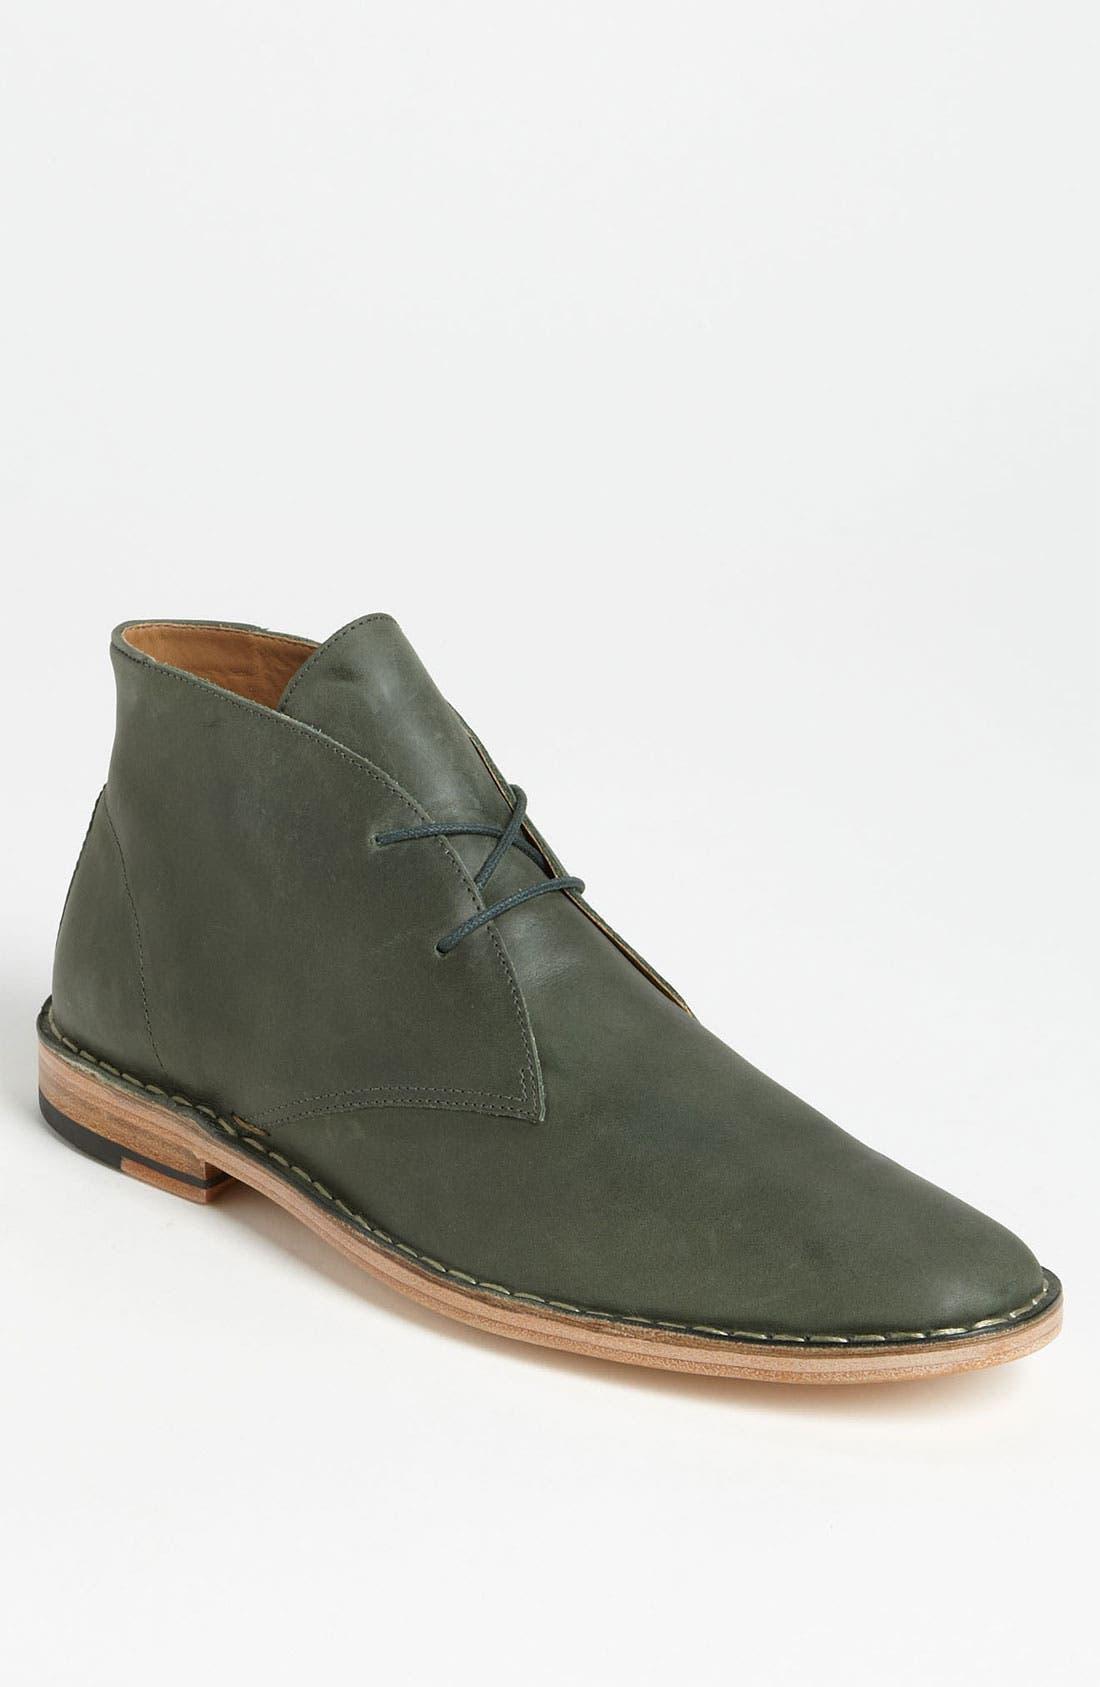 Alternate Image 1 Selected - Shipley & Halmos 'Max' Desert Boot